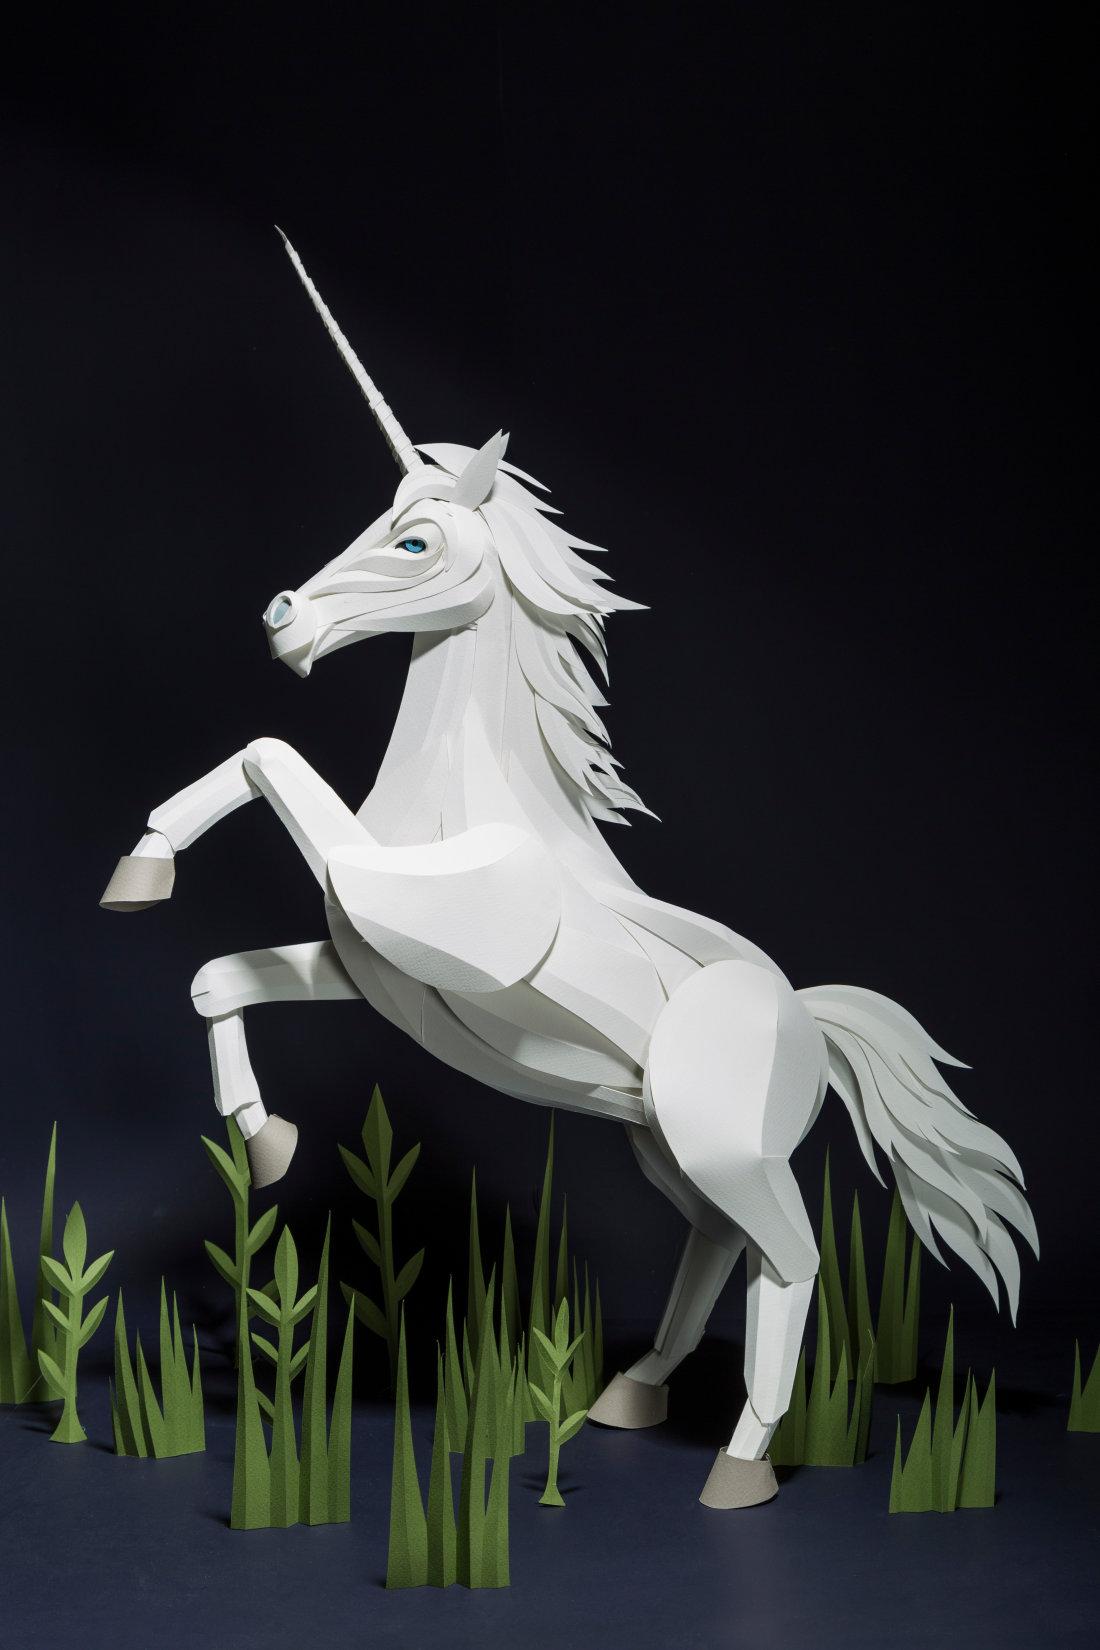 comc_unicorn4782.jpg